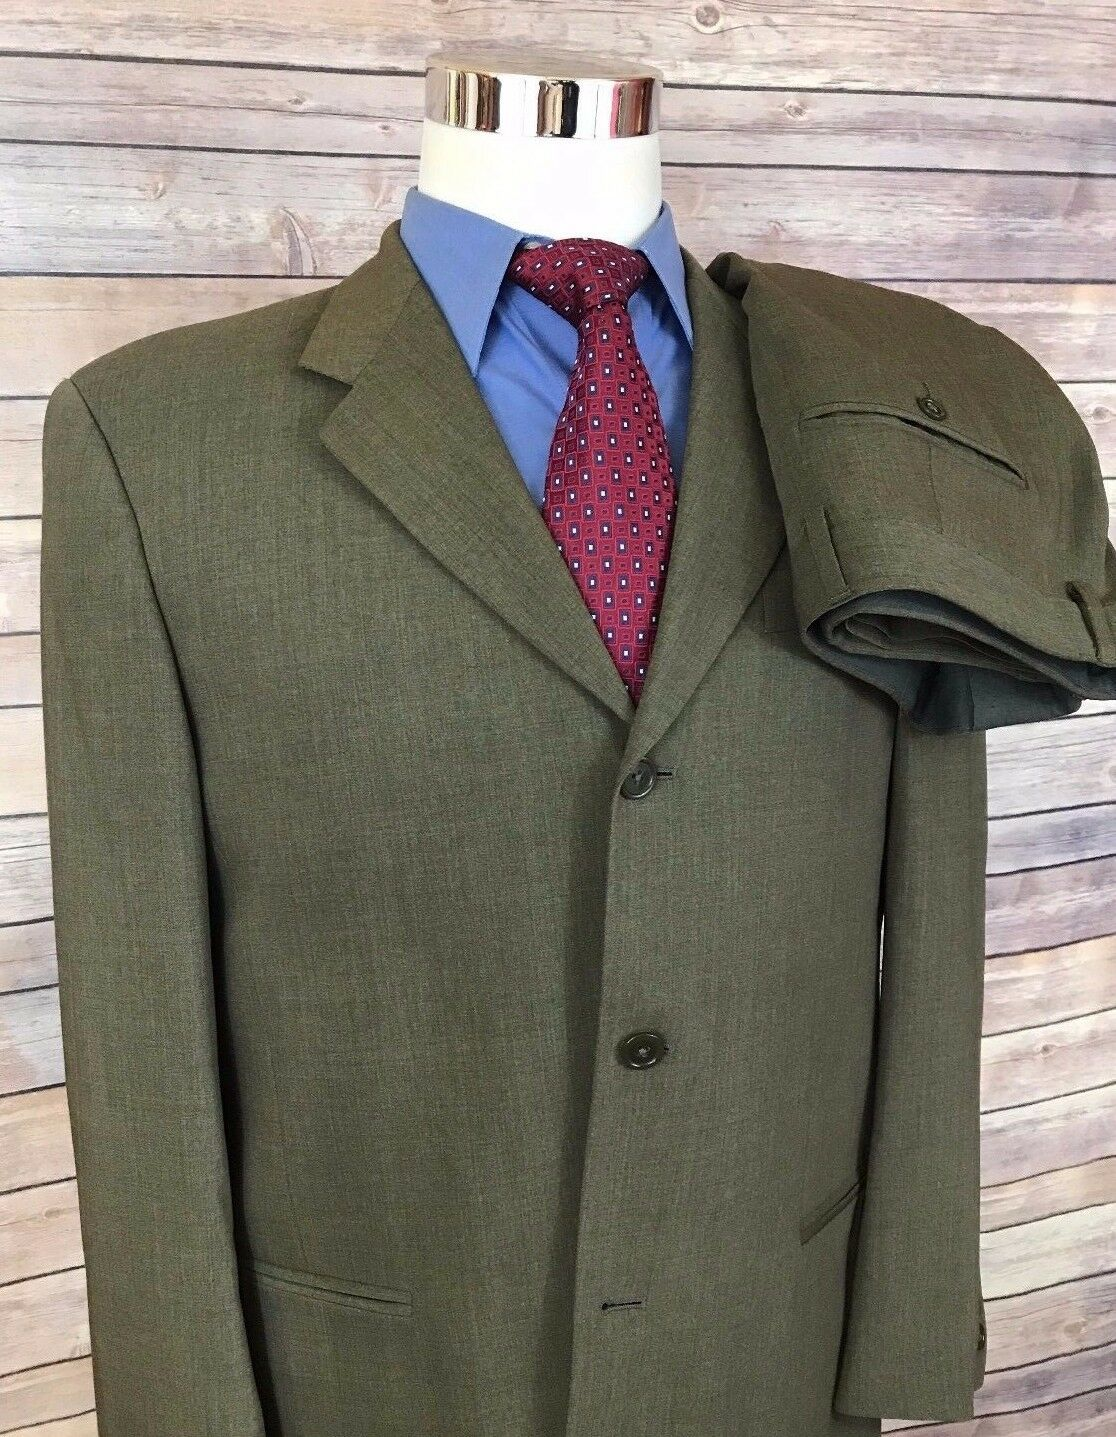 women Karan Signature Green Textured Slim Fit Wool Suit Men's 40R 34x26 Mint